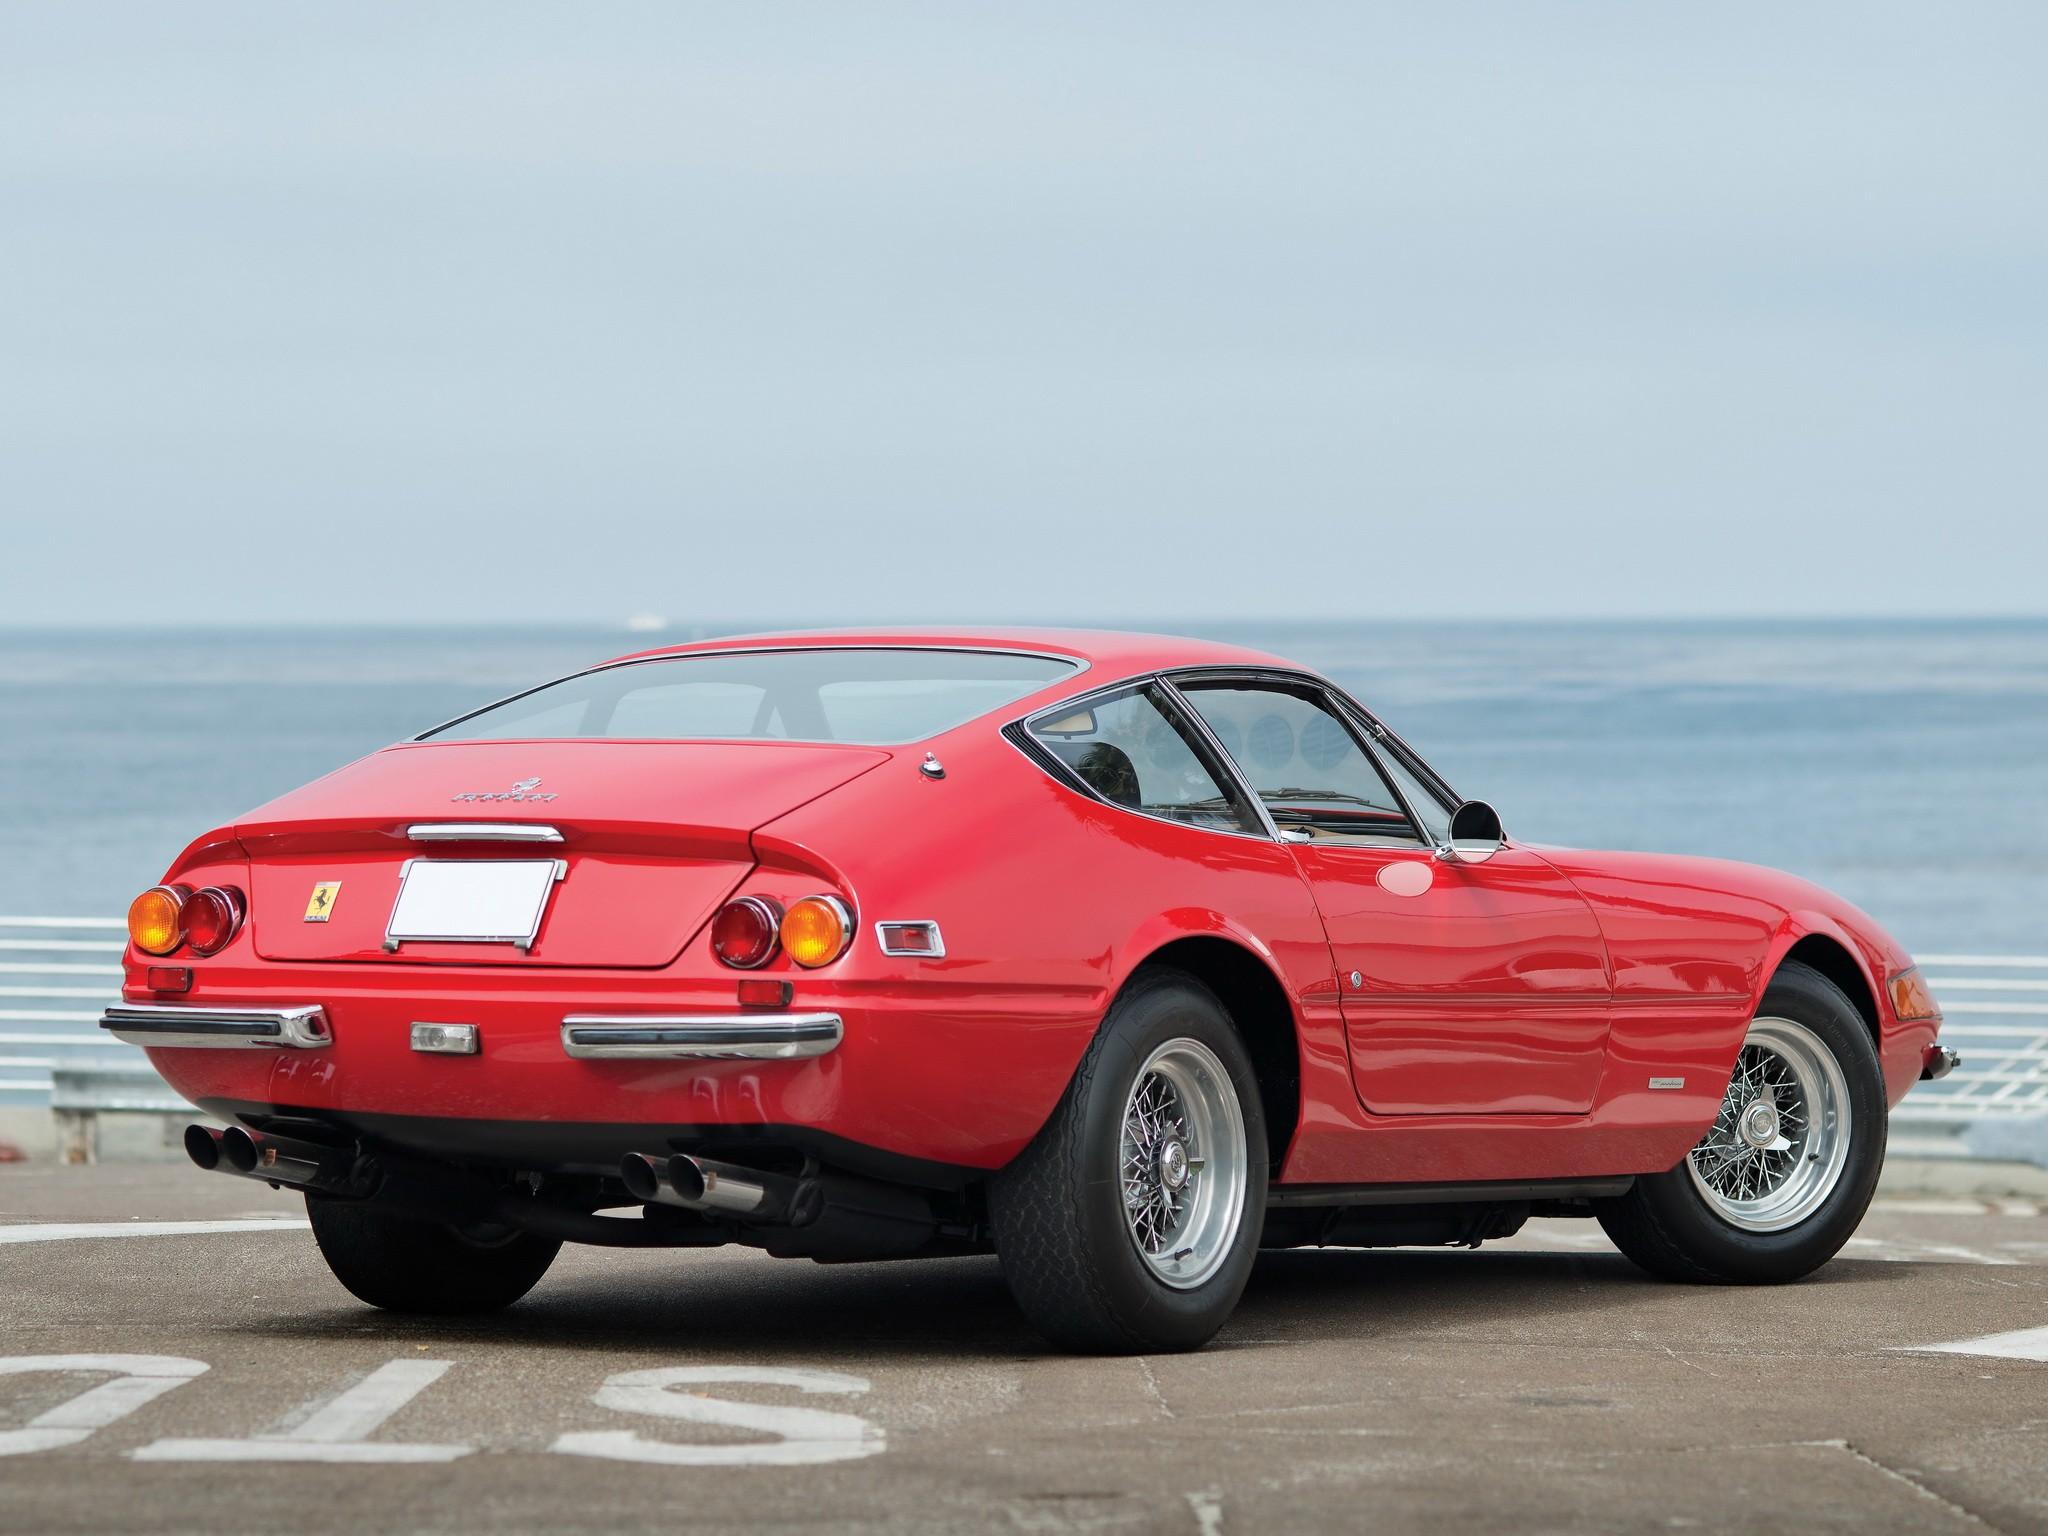 Ferrari 365 Gtb 4 Daytona Specs 1968 1969 1970 1971